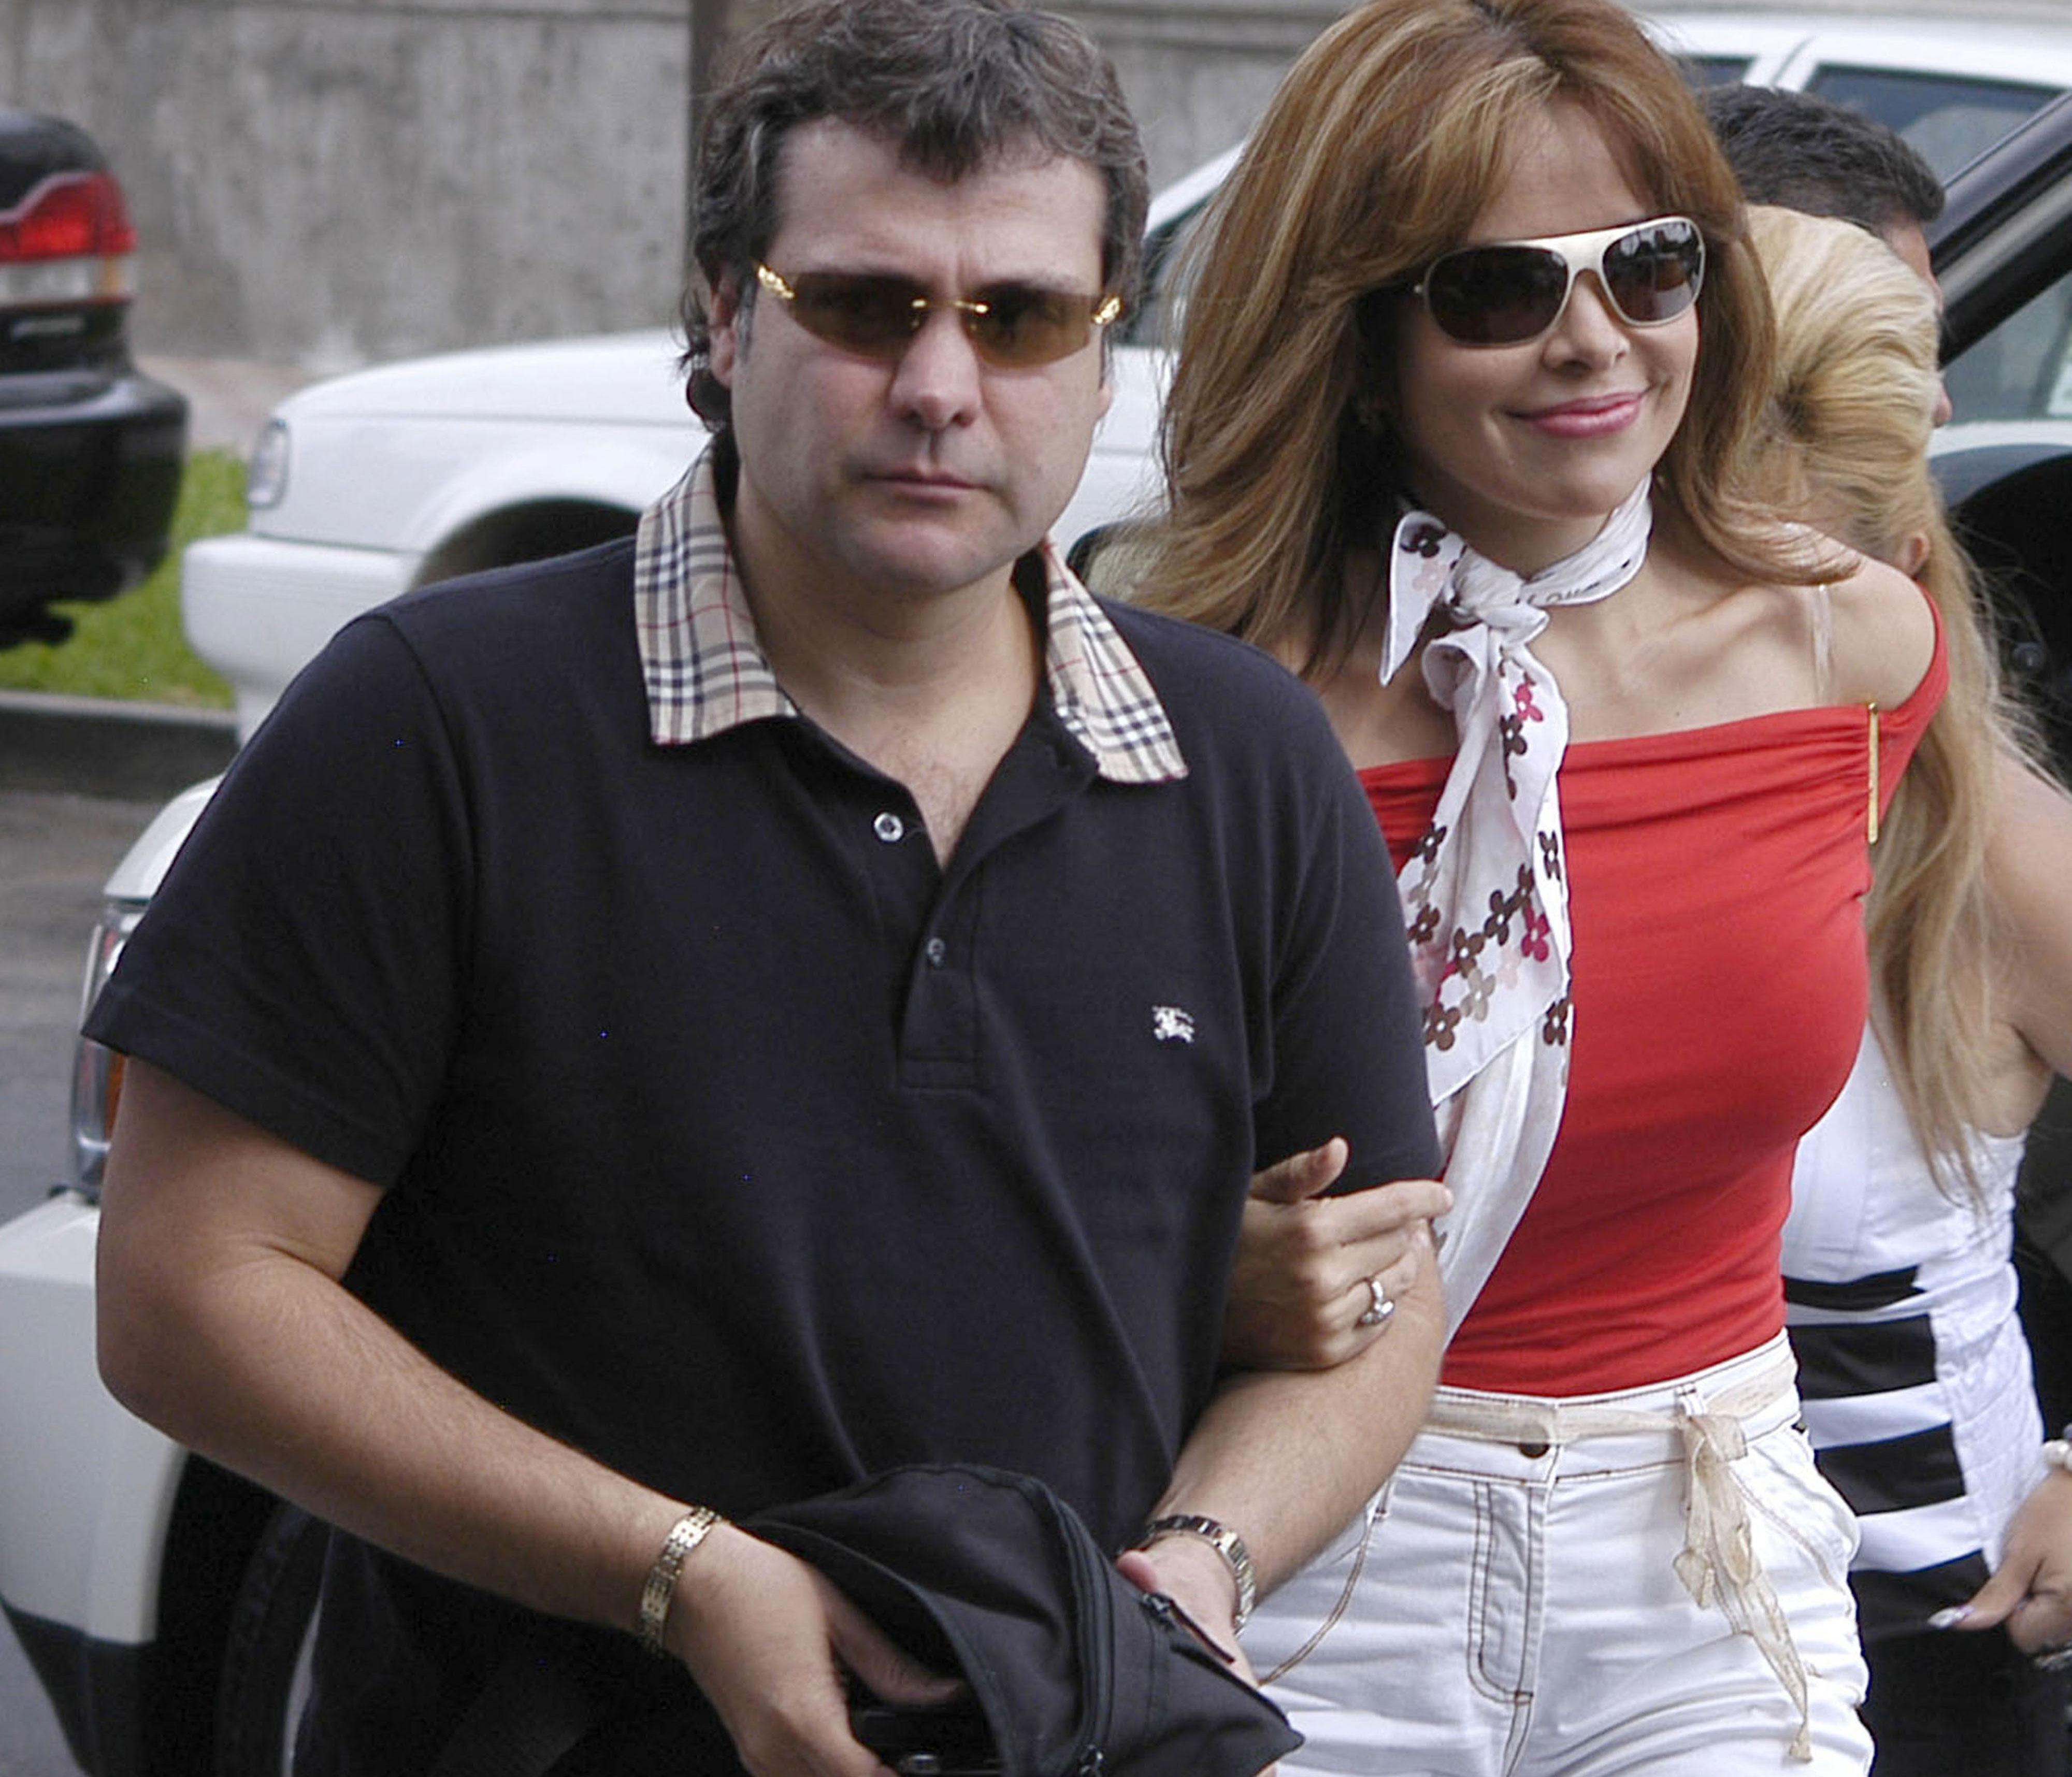 Asesinan al cuñado de Gloria Trevi